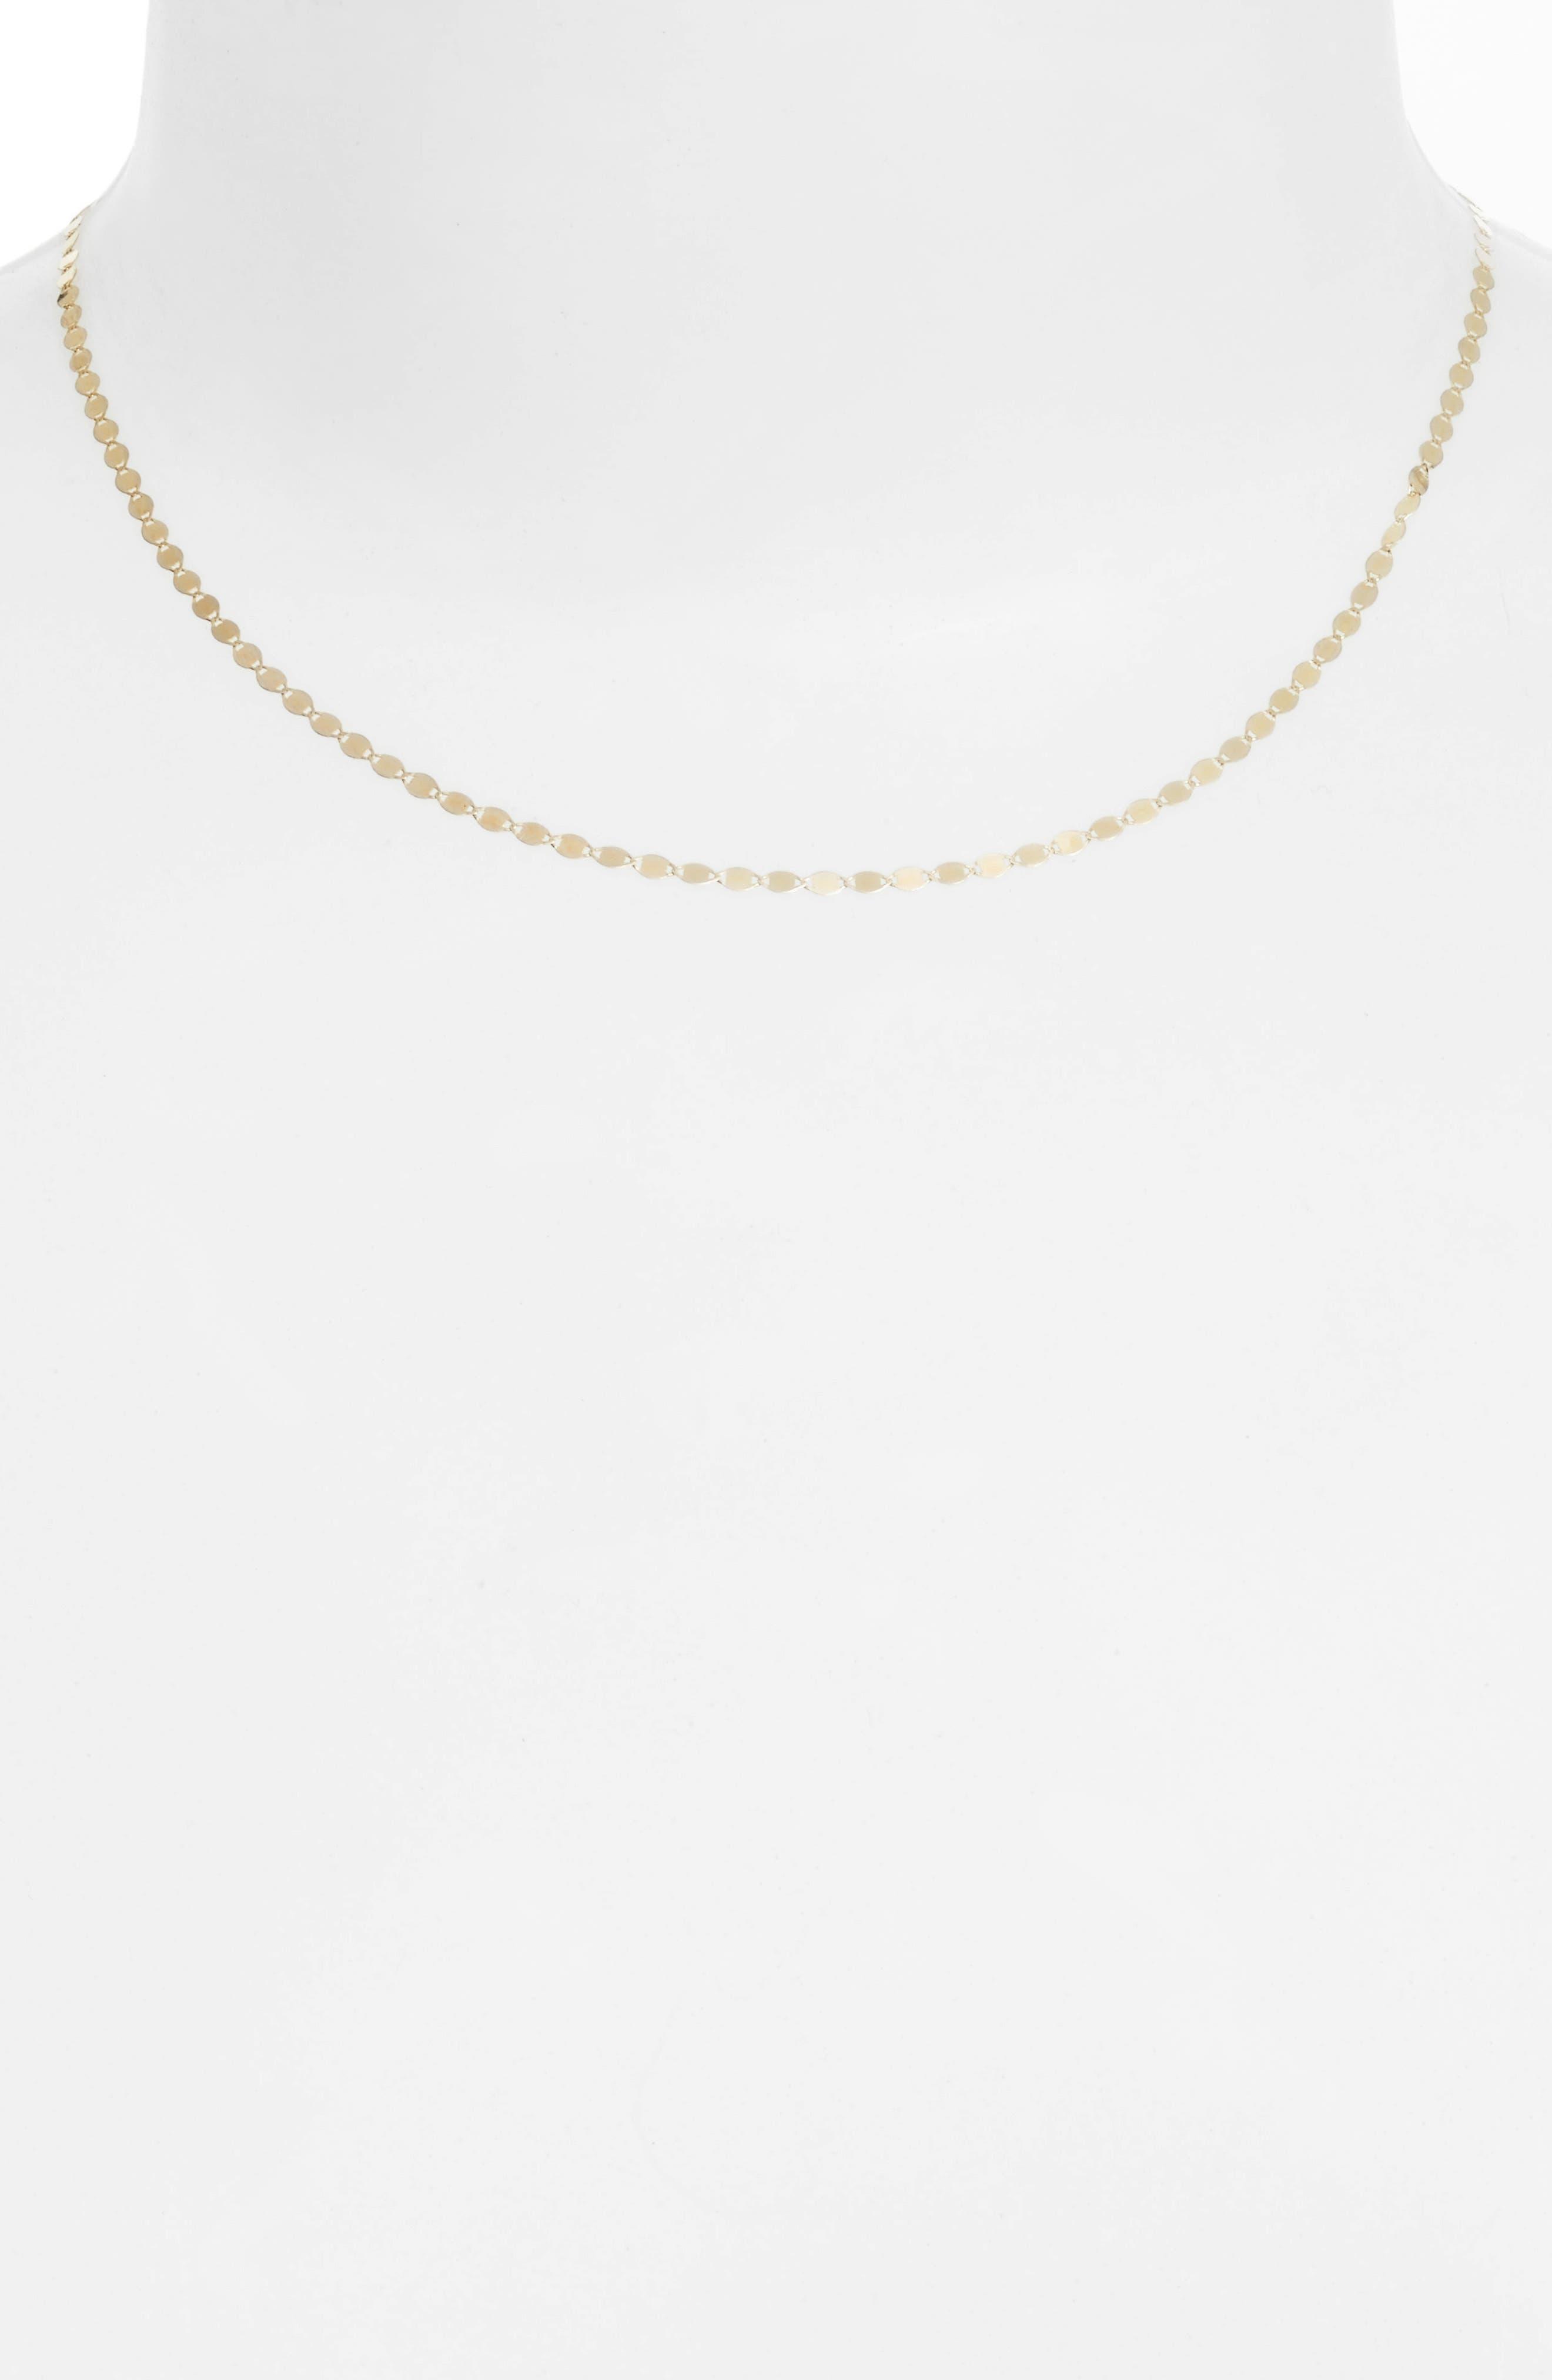 Lana Jewelry Petite Nude Chain Choker